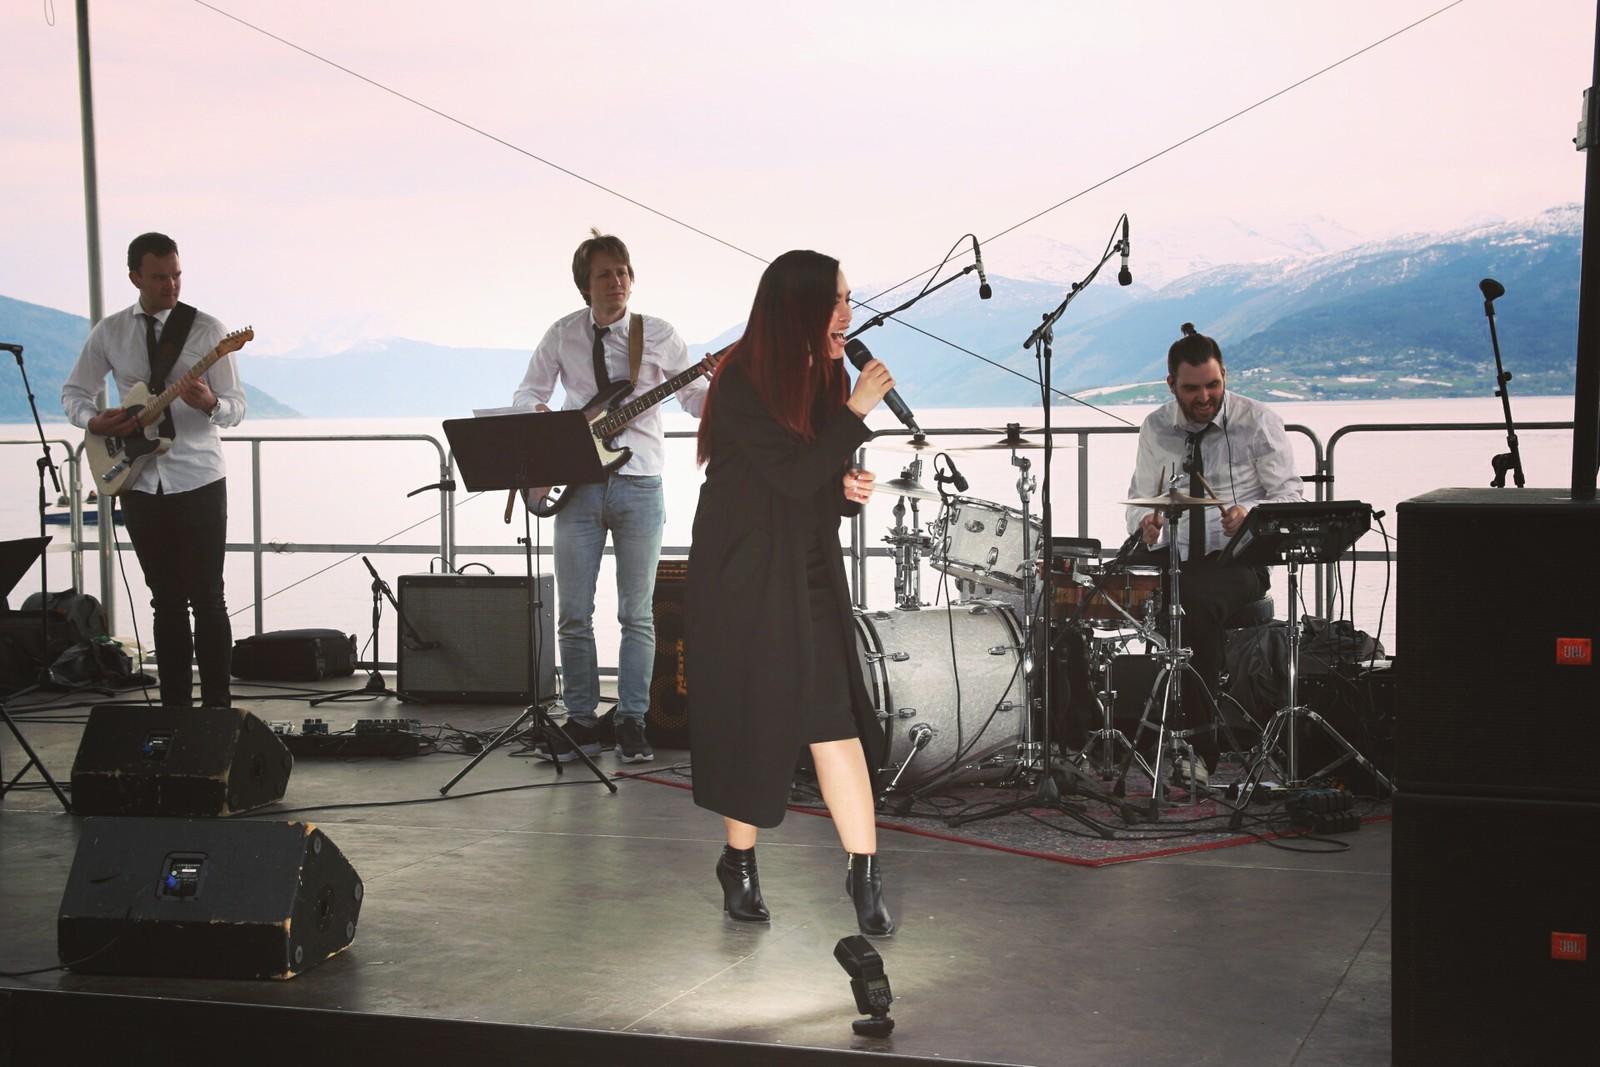 MYRNA: Soulstjerna frå Norge heldt gratiskonsert i hotellhagen ved Kviknes hotell laurdag.